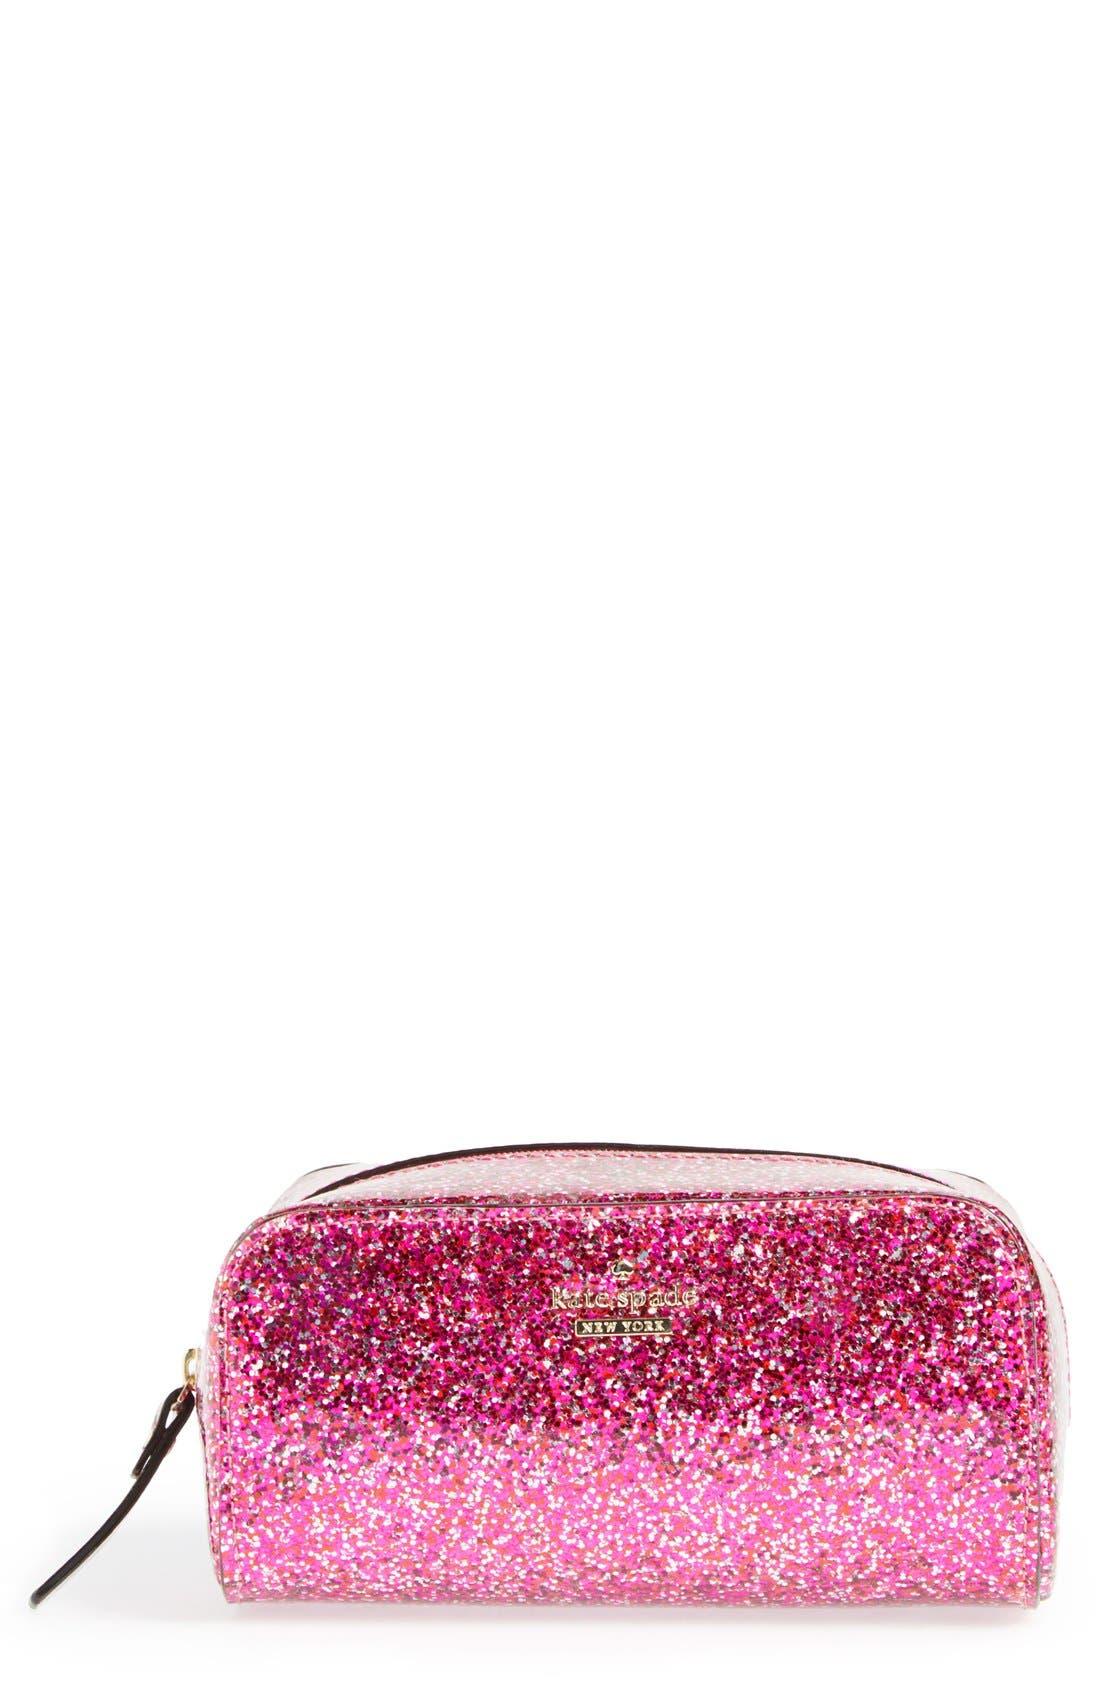 KATE SPADE NEW YORK 'glitter bug - ezra' cosmetics case, Main, color, 600